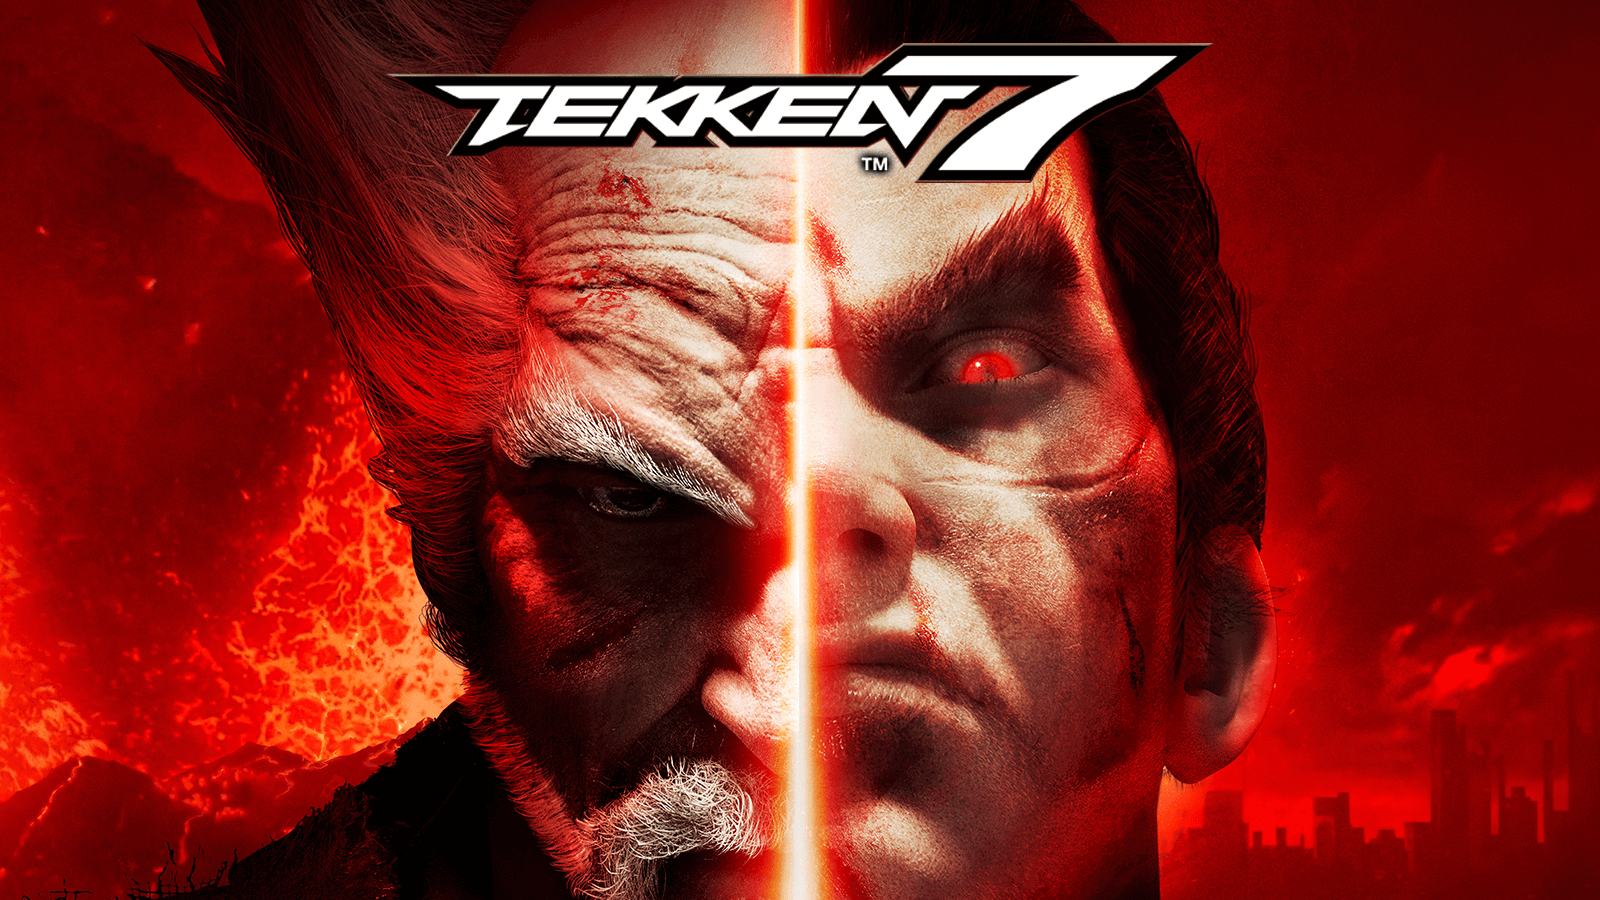 Tekken 7 Match 1 Fighting Game For Free Mutliplayer